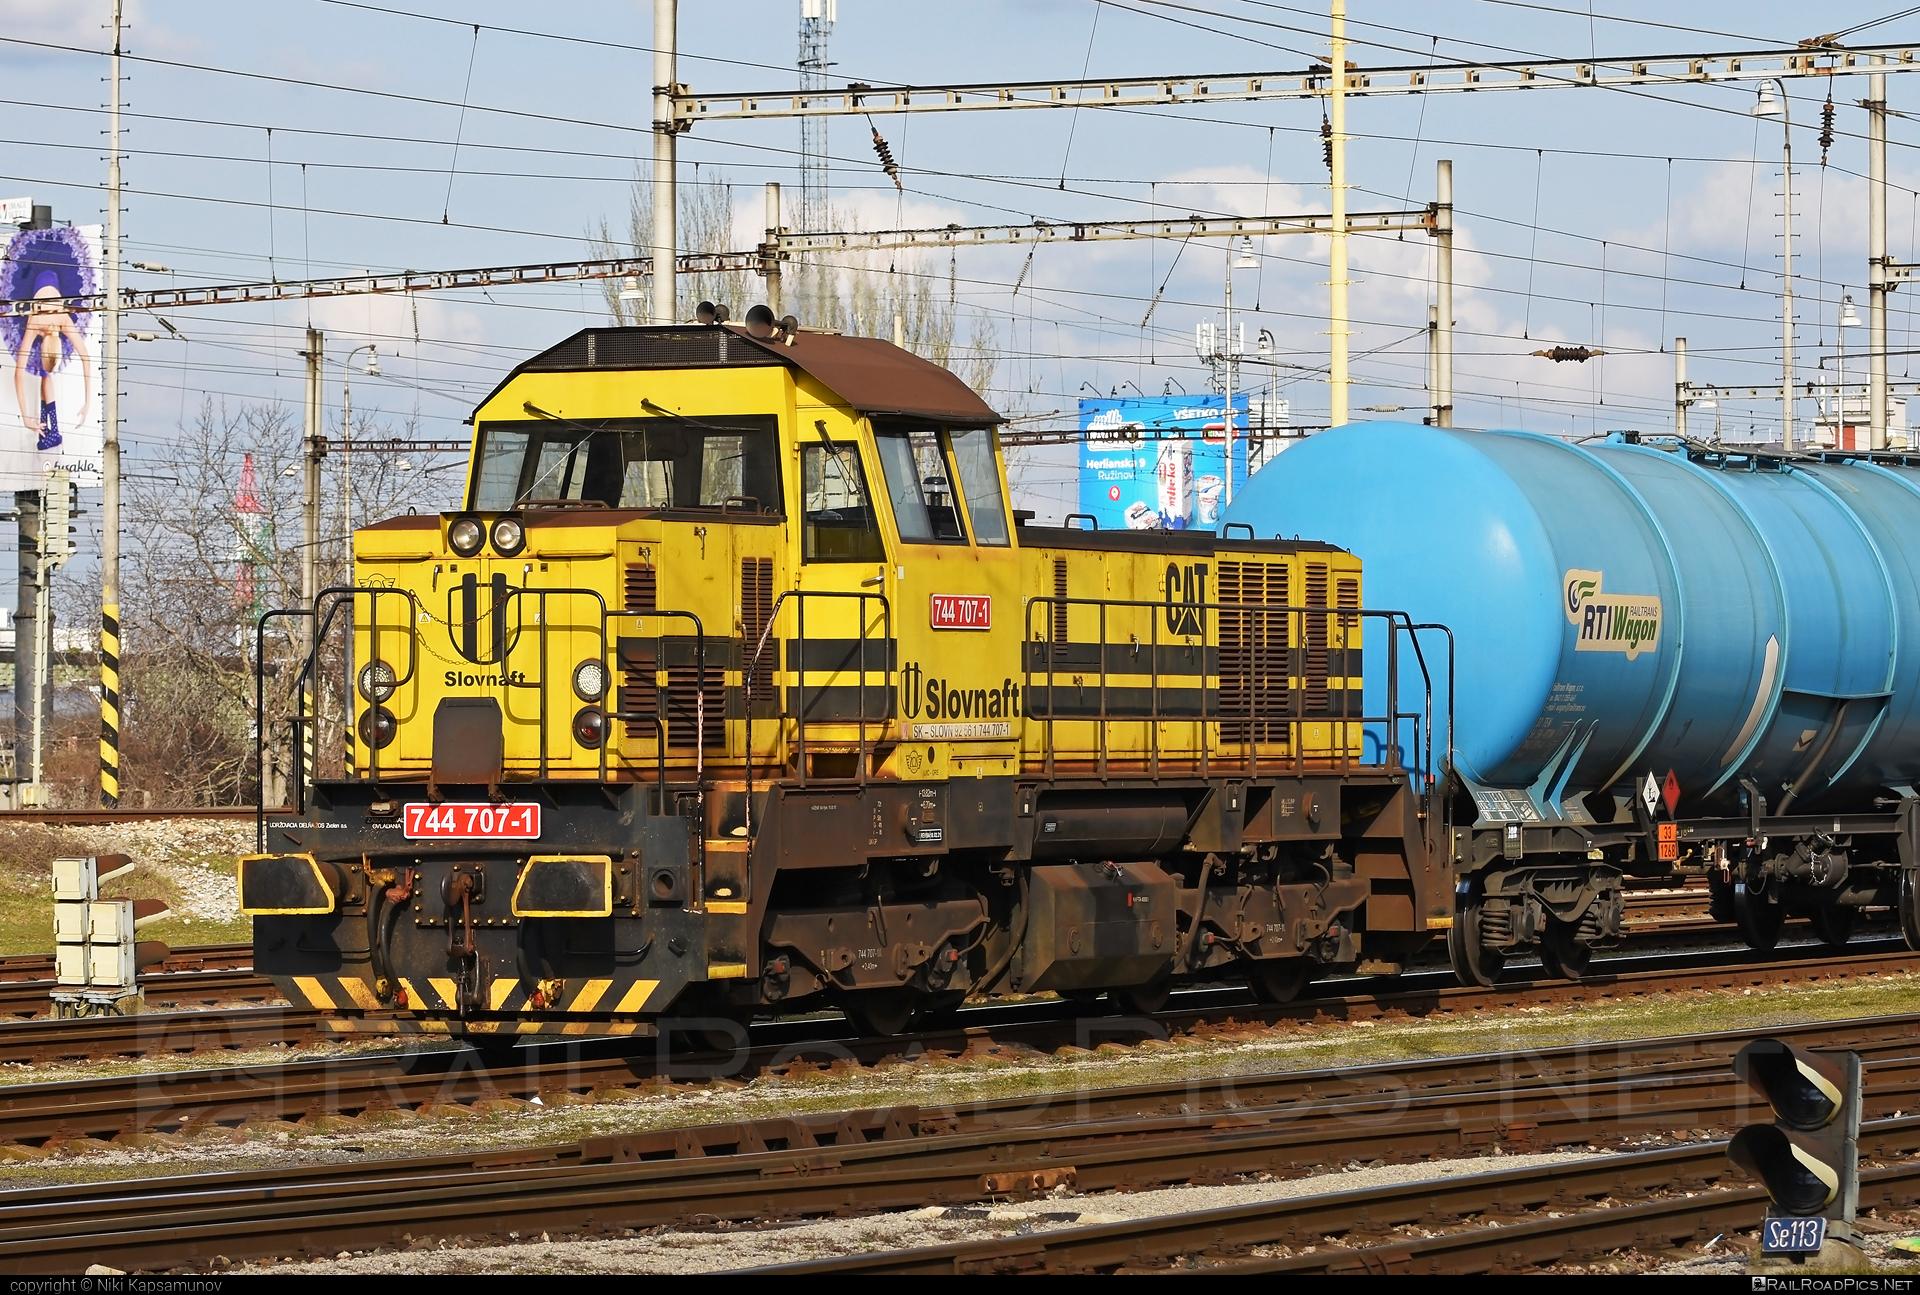 ŽOS Zvolen Class 744.7 - 744 707-1 operated by SLOVNAFT, a.s. #kesselwagen #locomotive7447 #slovnaft #tankwagon #zoszvolen #zoszvolen7447